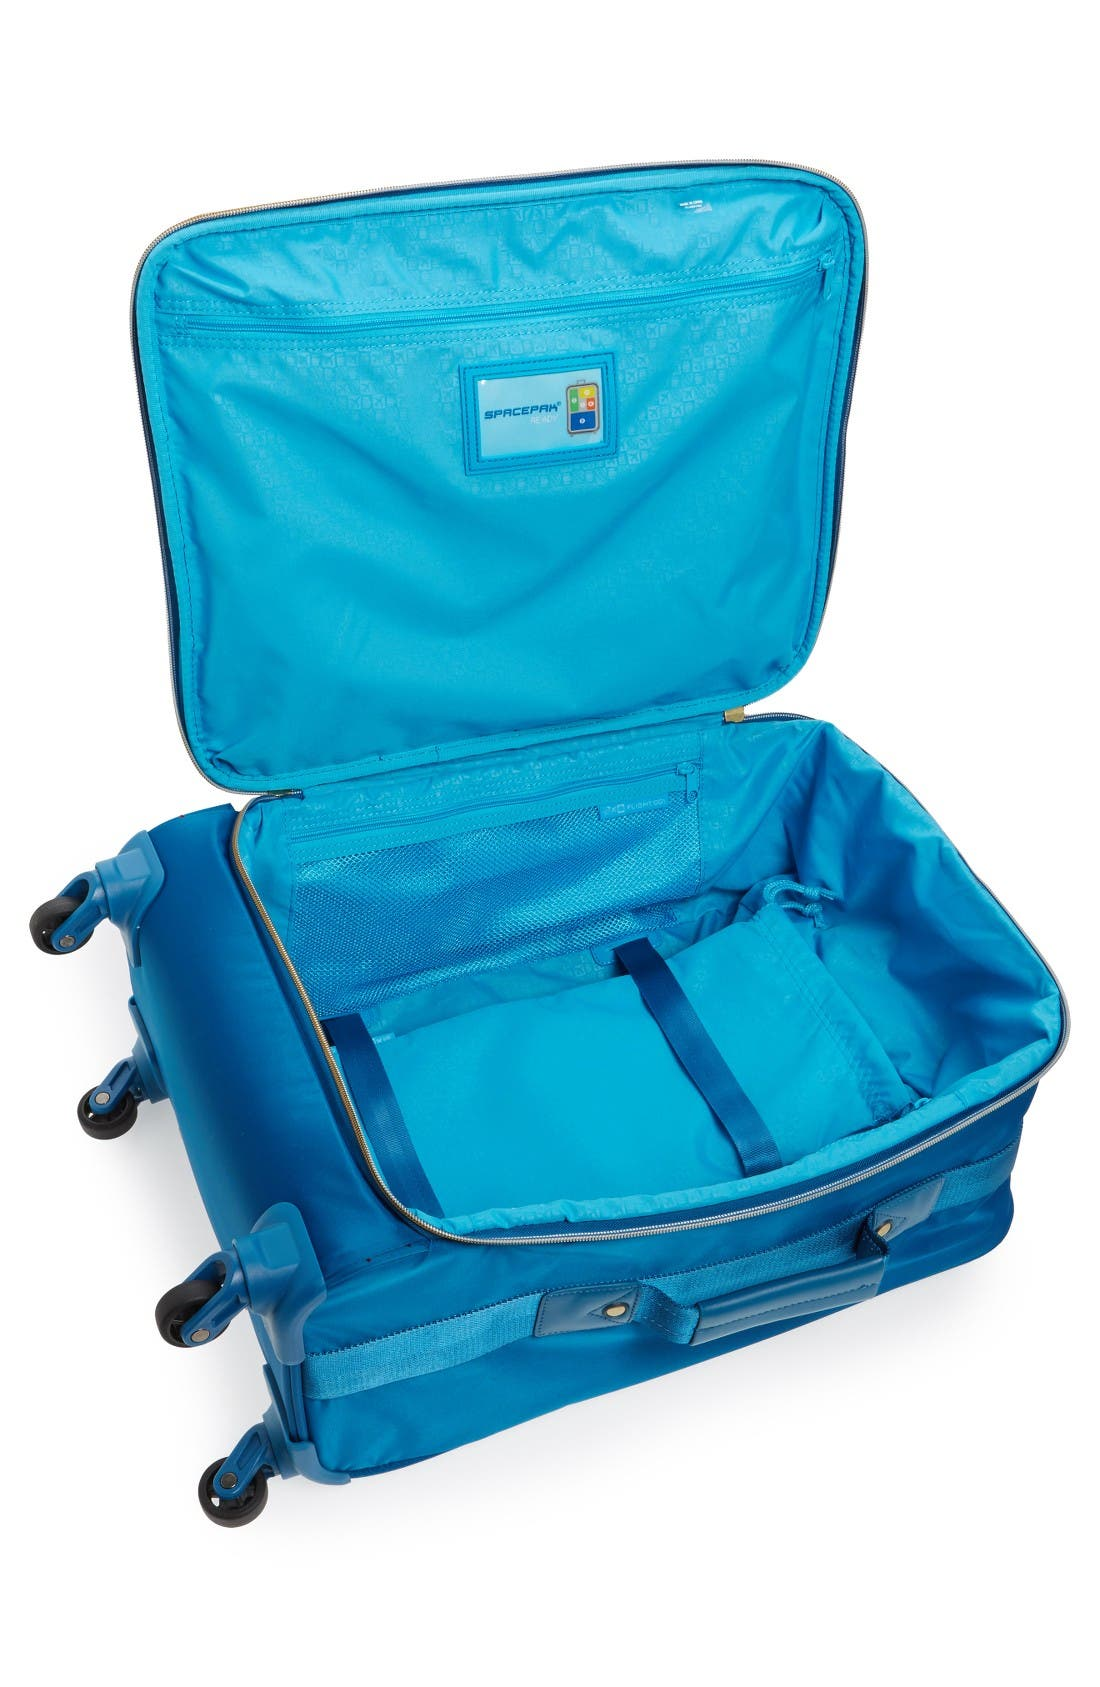 Alternate Image 3  - Flight 001 Avionette 19-Inch Rolling Carry-On Suitcase